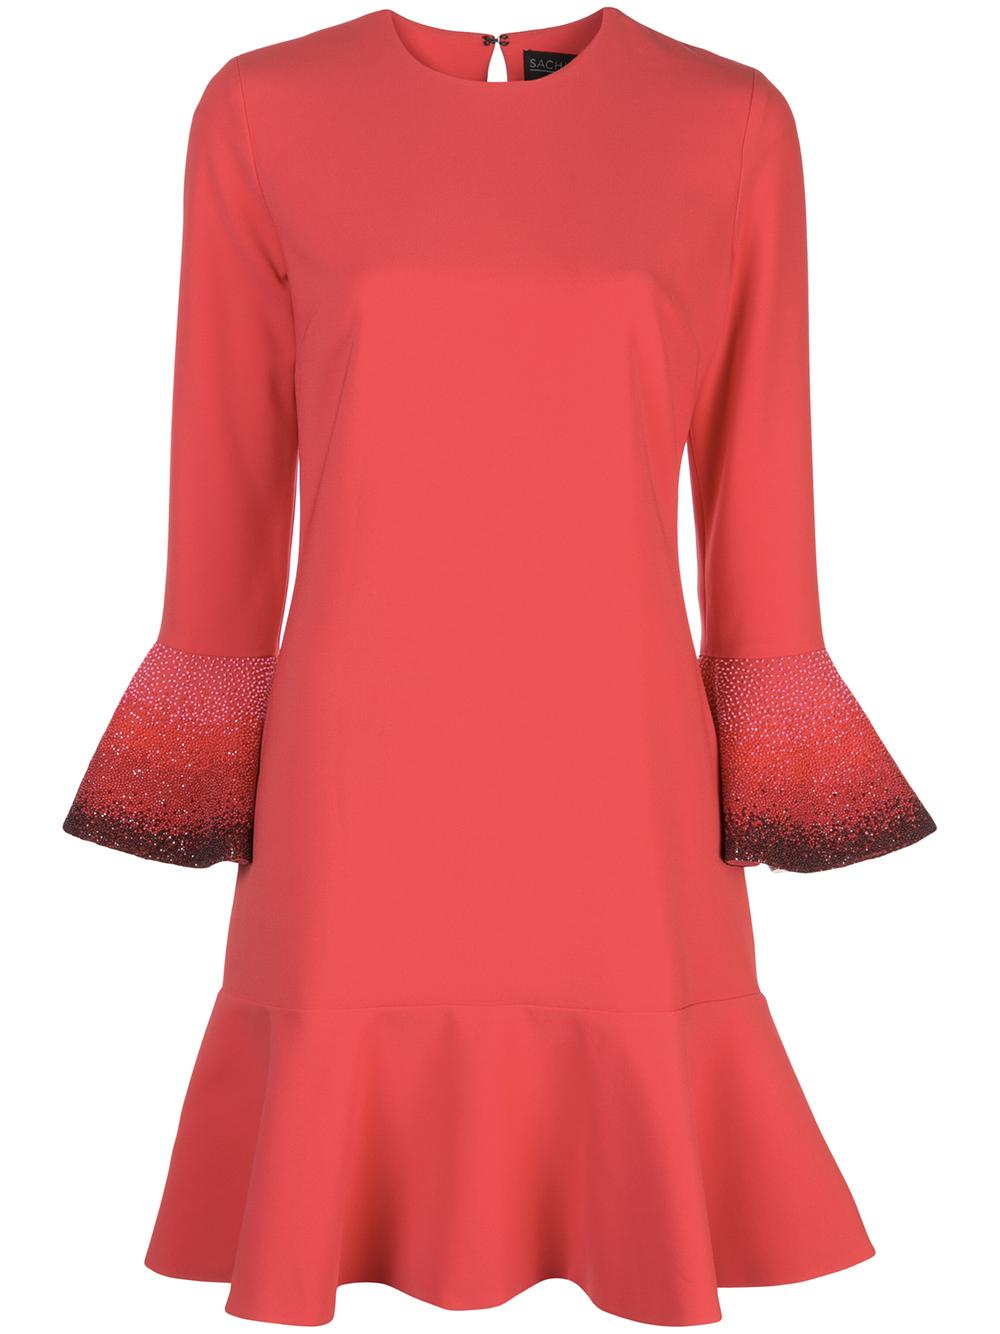 Madeleine Jewel Neck 3/4 Sleeve Shift Dress